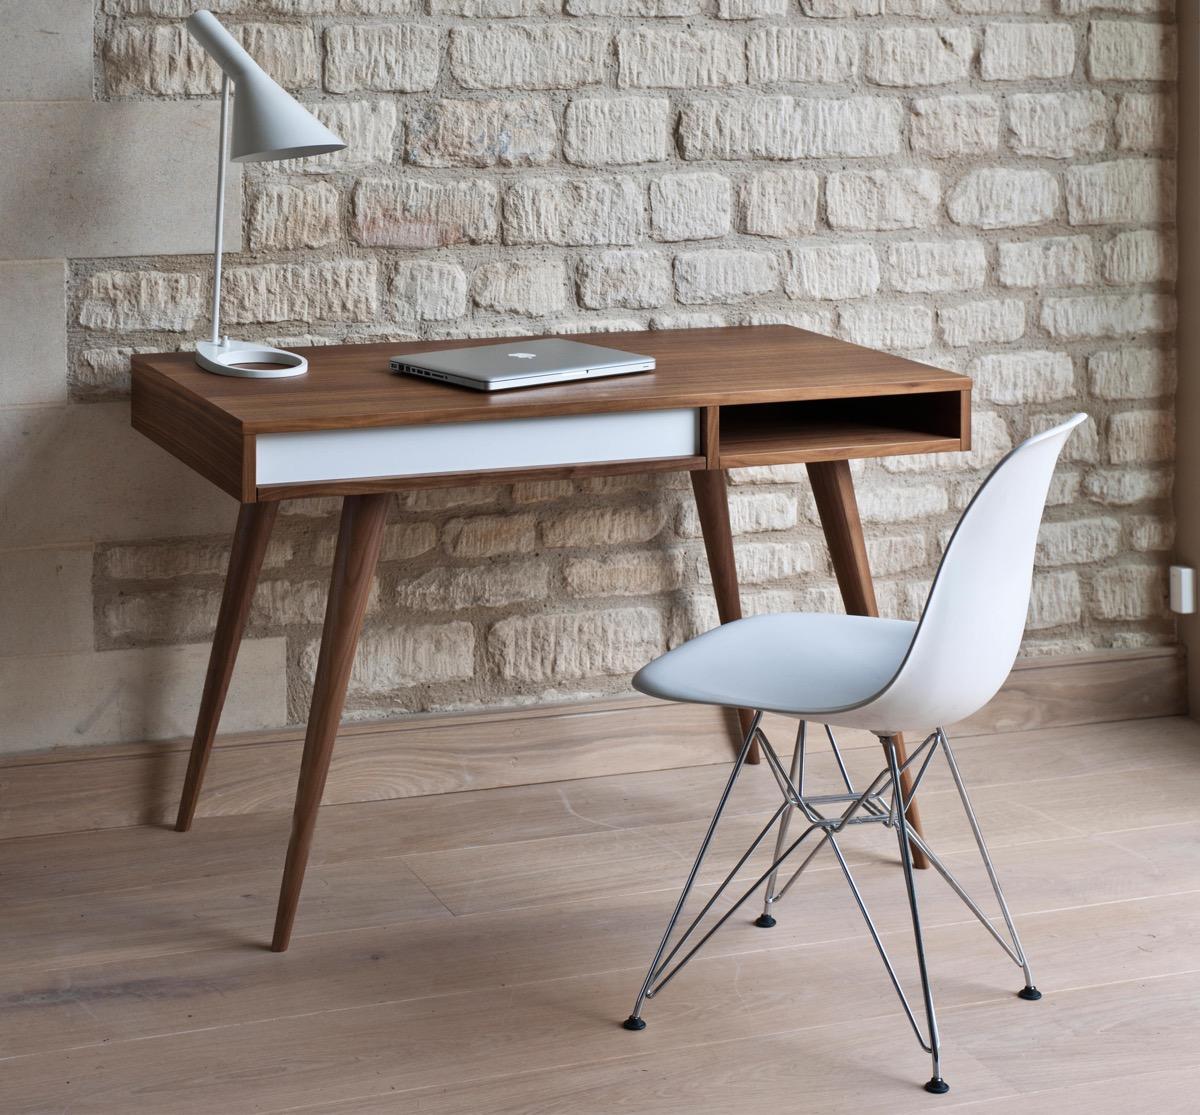 home office desk chairs revolving chair for sale in karachi unique desks